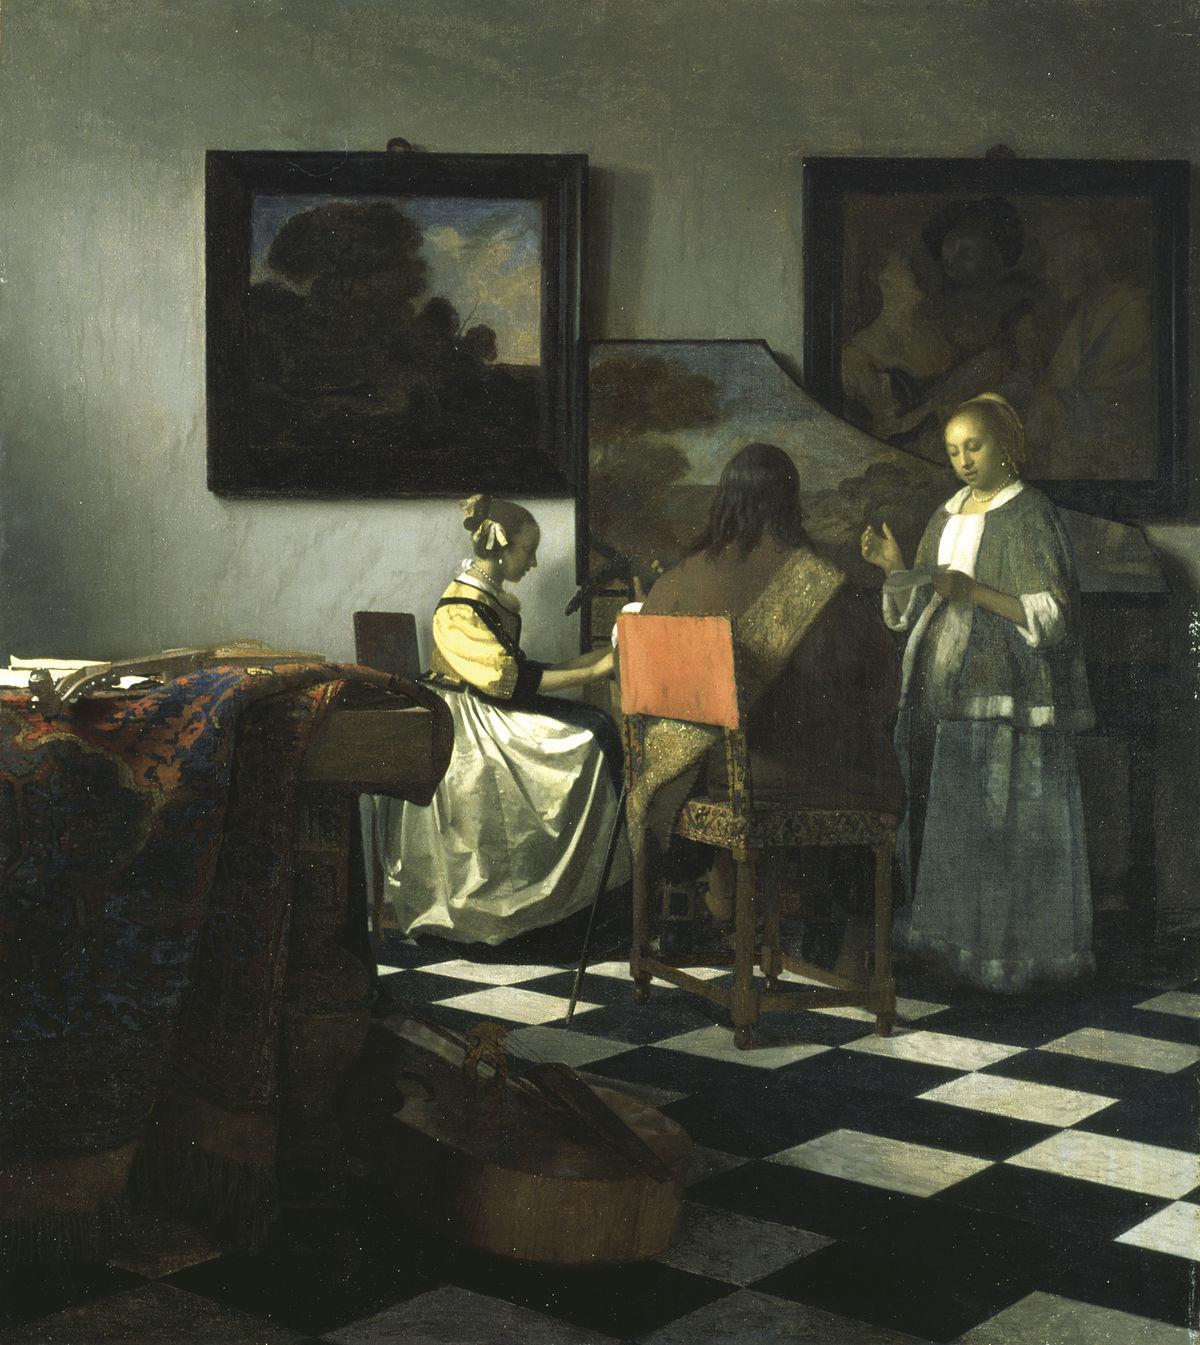 https-::upload.wikimedia.org:wikipedia:commons:thumb:c:c8:Vermeer_The_concert.JPG:1200px-Vermeer_The_concert.JPG